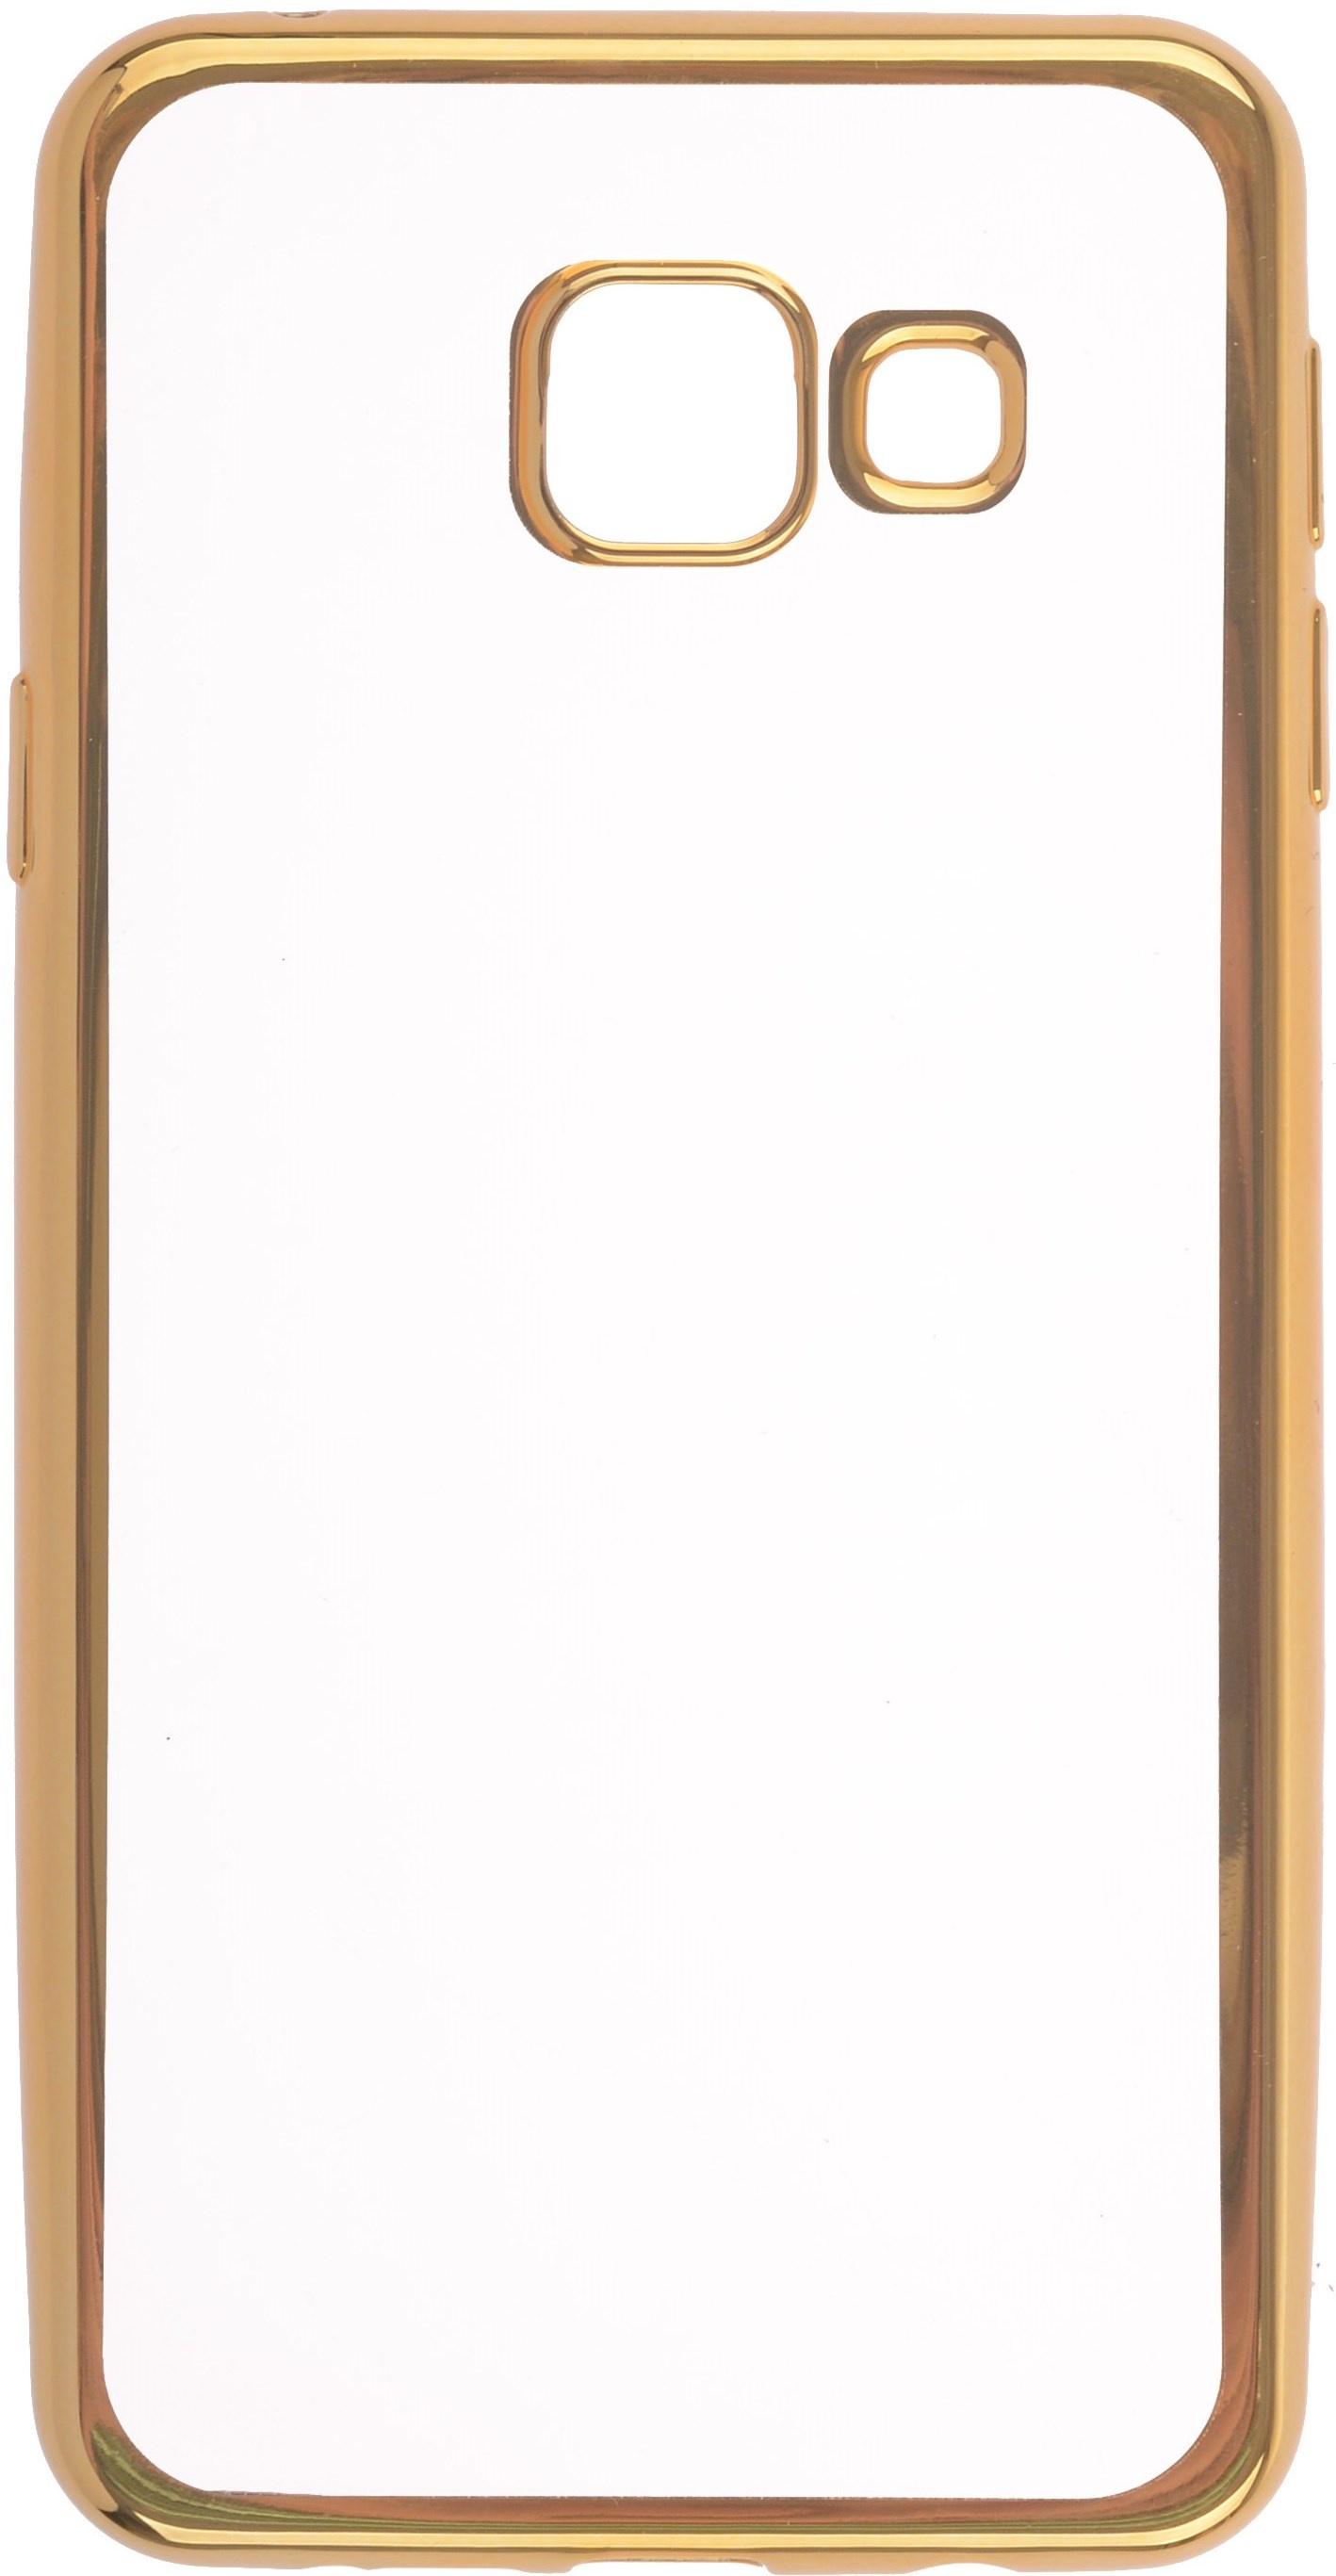 Чехол для сотового телефона skinBOX Silicone chrome border, 4660041407921, золотой skinbox 4people slim silicone чехол накладка для xiaomi redmi 4a transparent